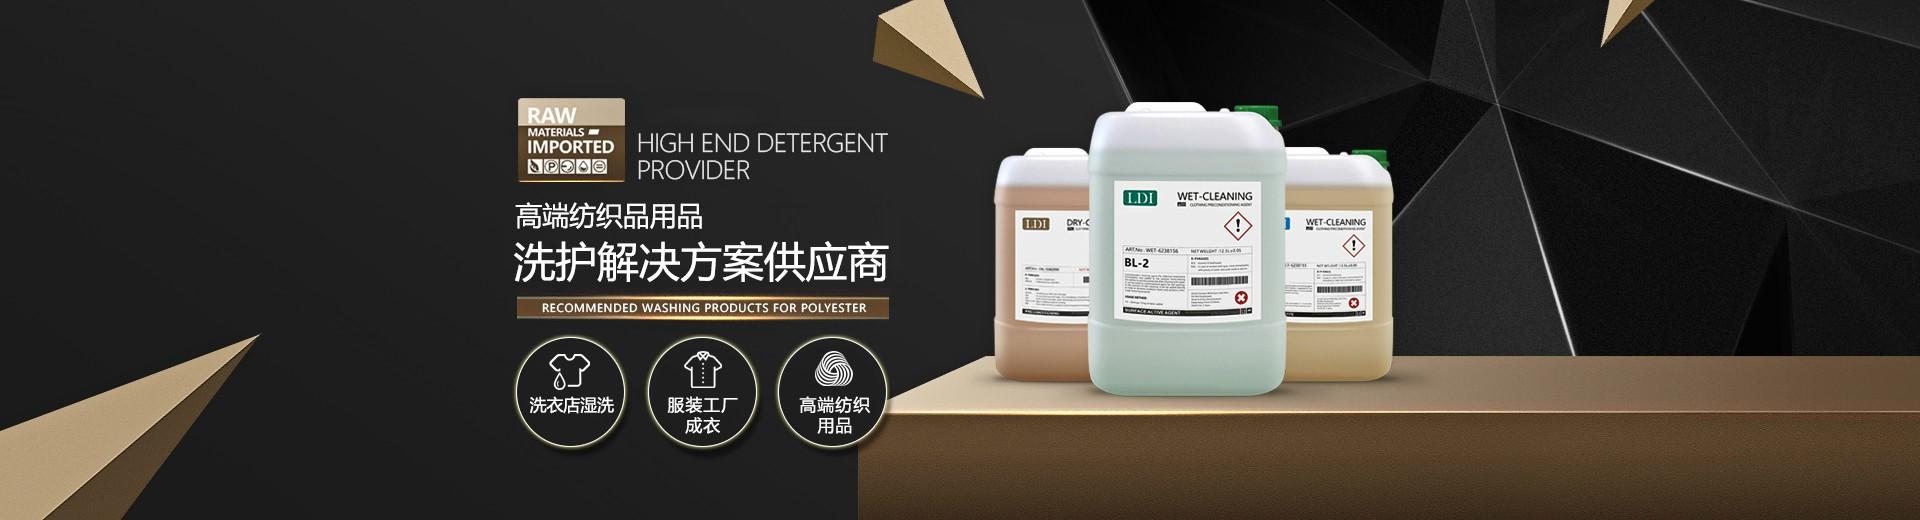 LDI高端品质洗涤产品